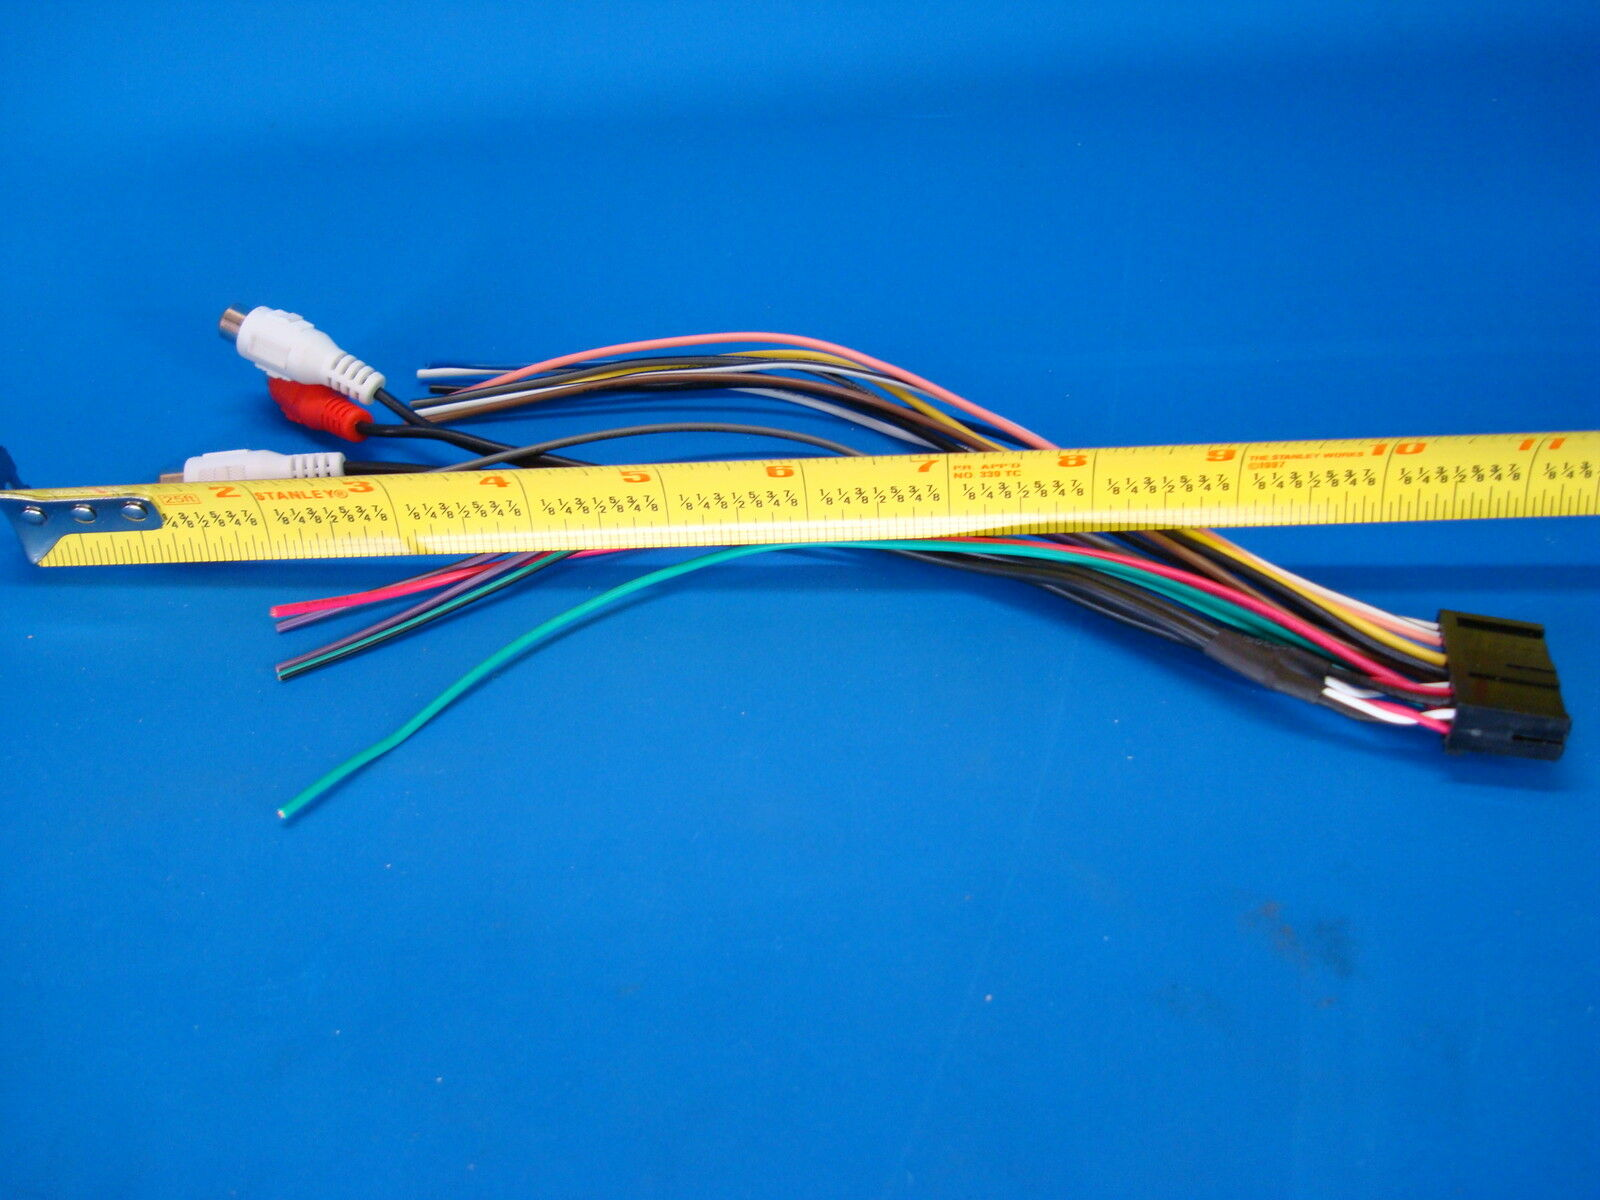 hight resolution of xo vision 20 pin radio wire harness stereo power plug back clip xod1752bt ebay